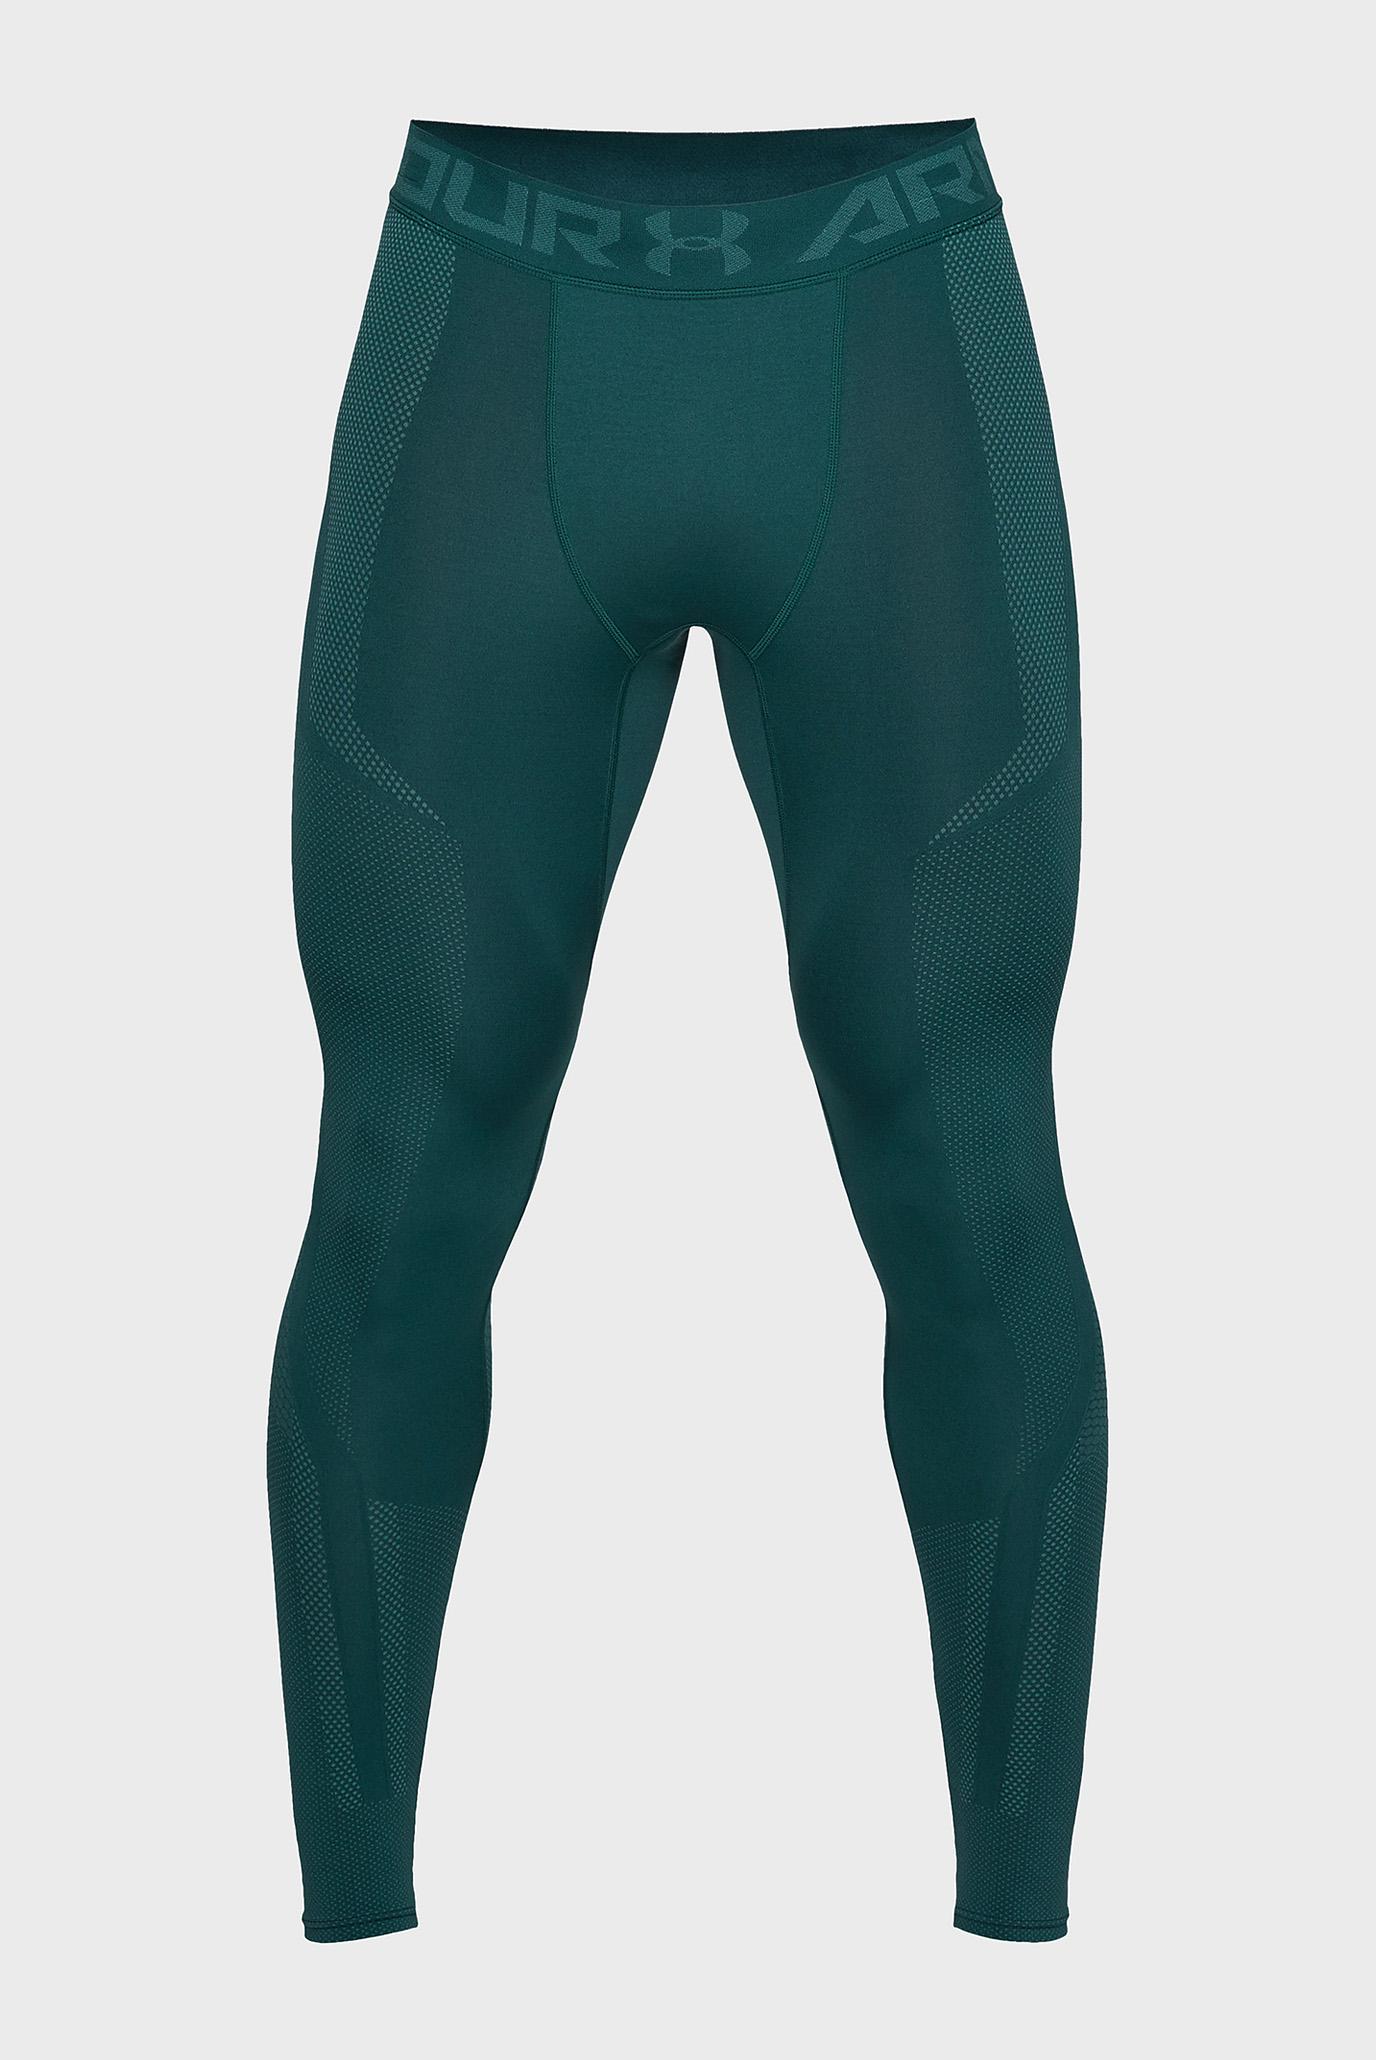 Мужские зеленые тайтсы Vanish Seamless Legging Under Armour